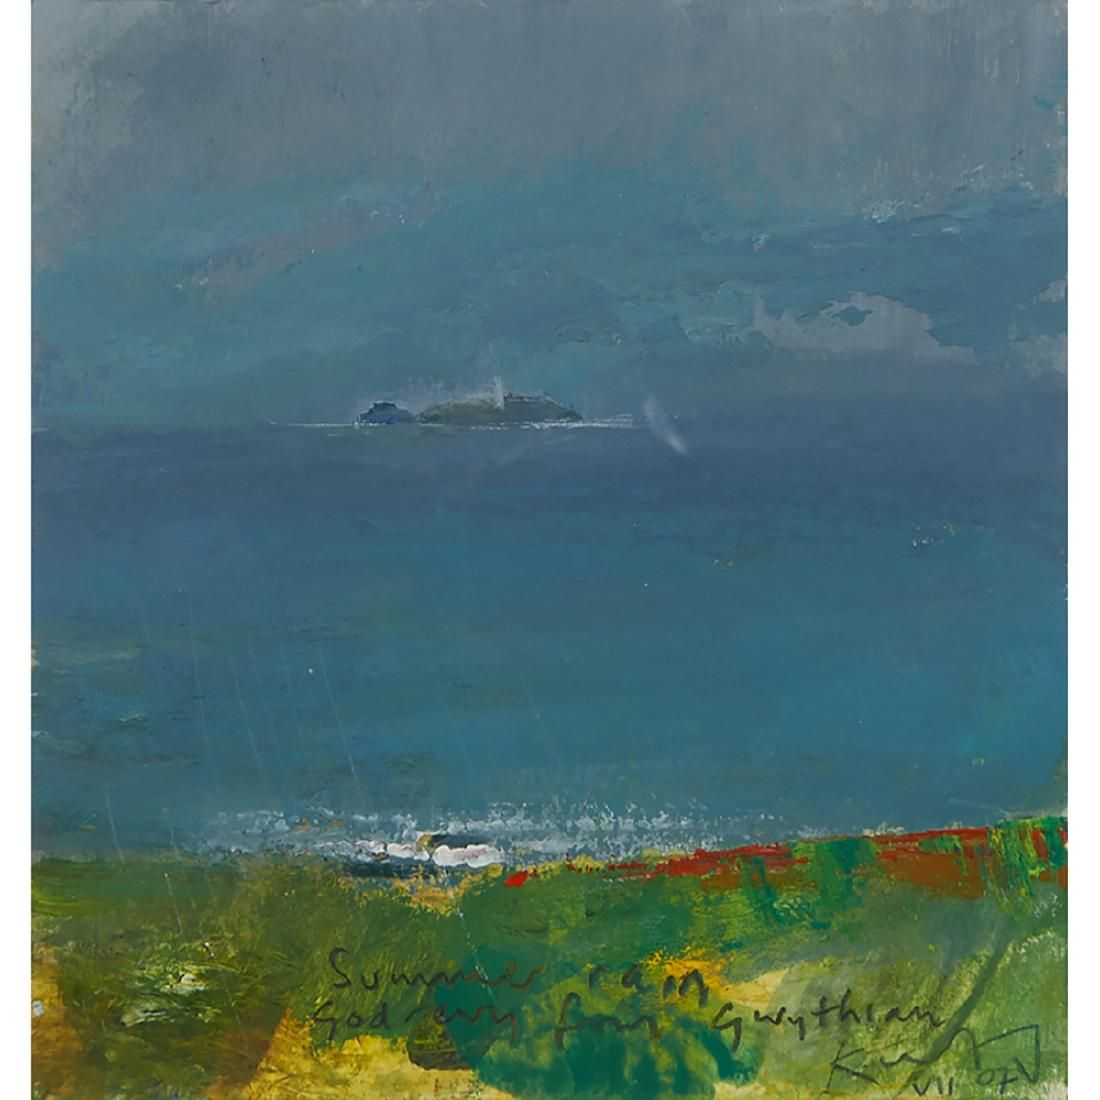 Kurt Jackson, Summer Rain Godrevy from Gwythian